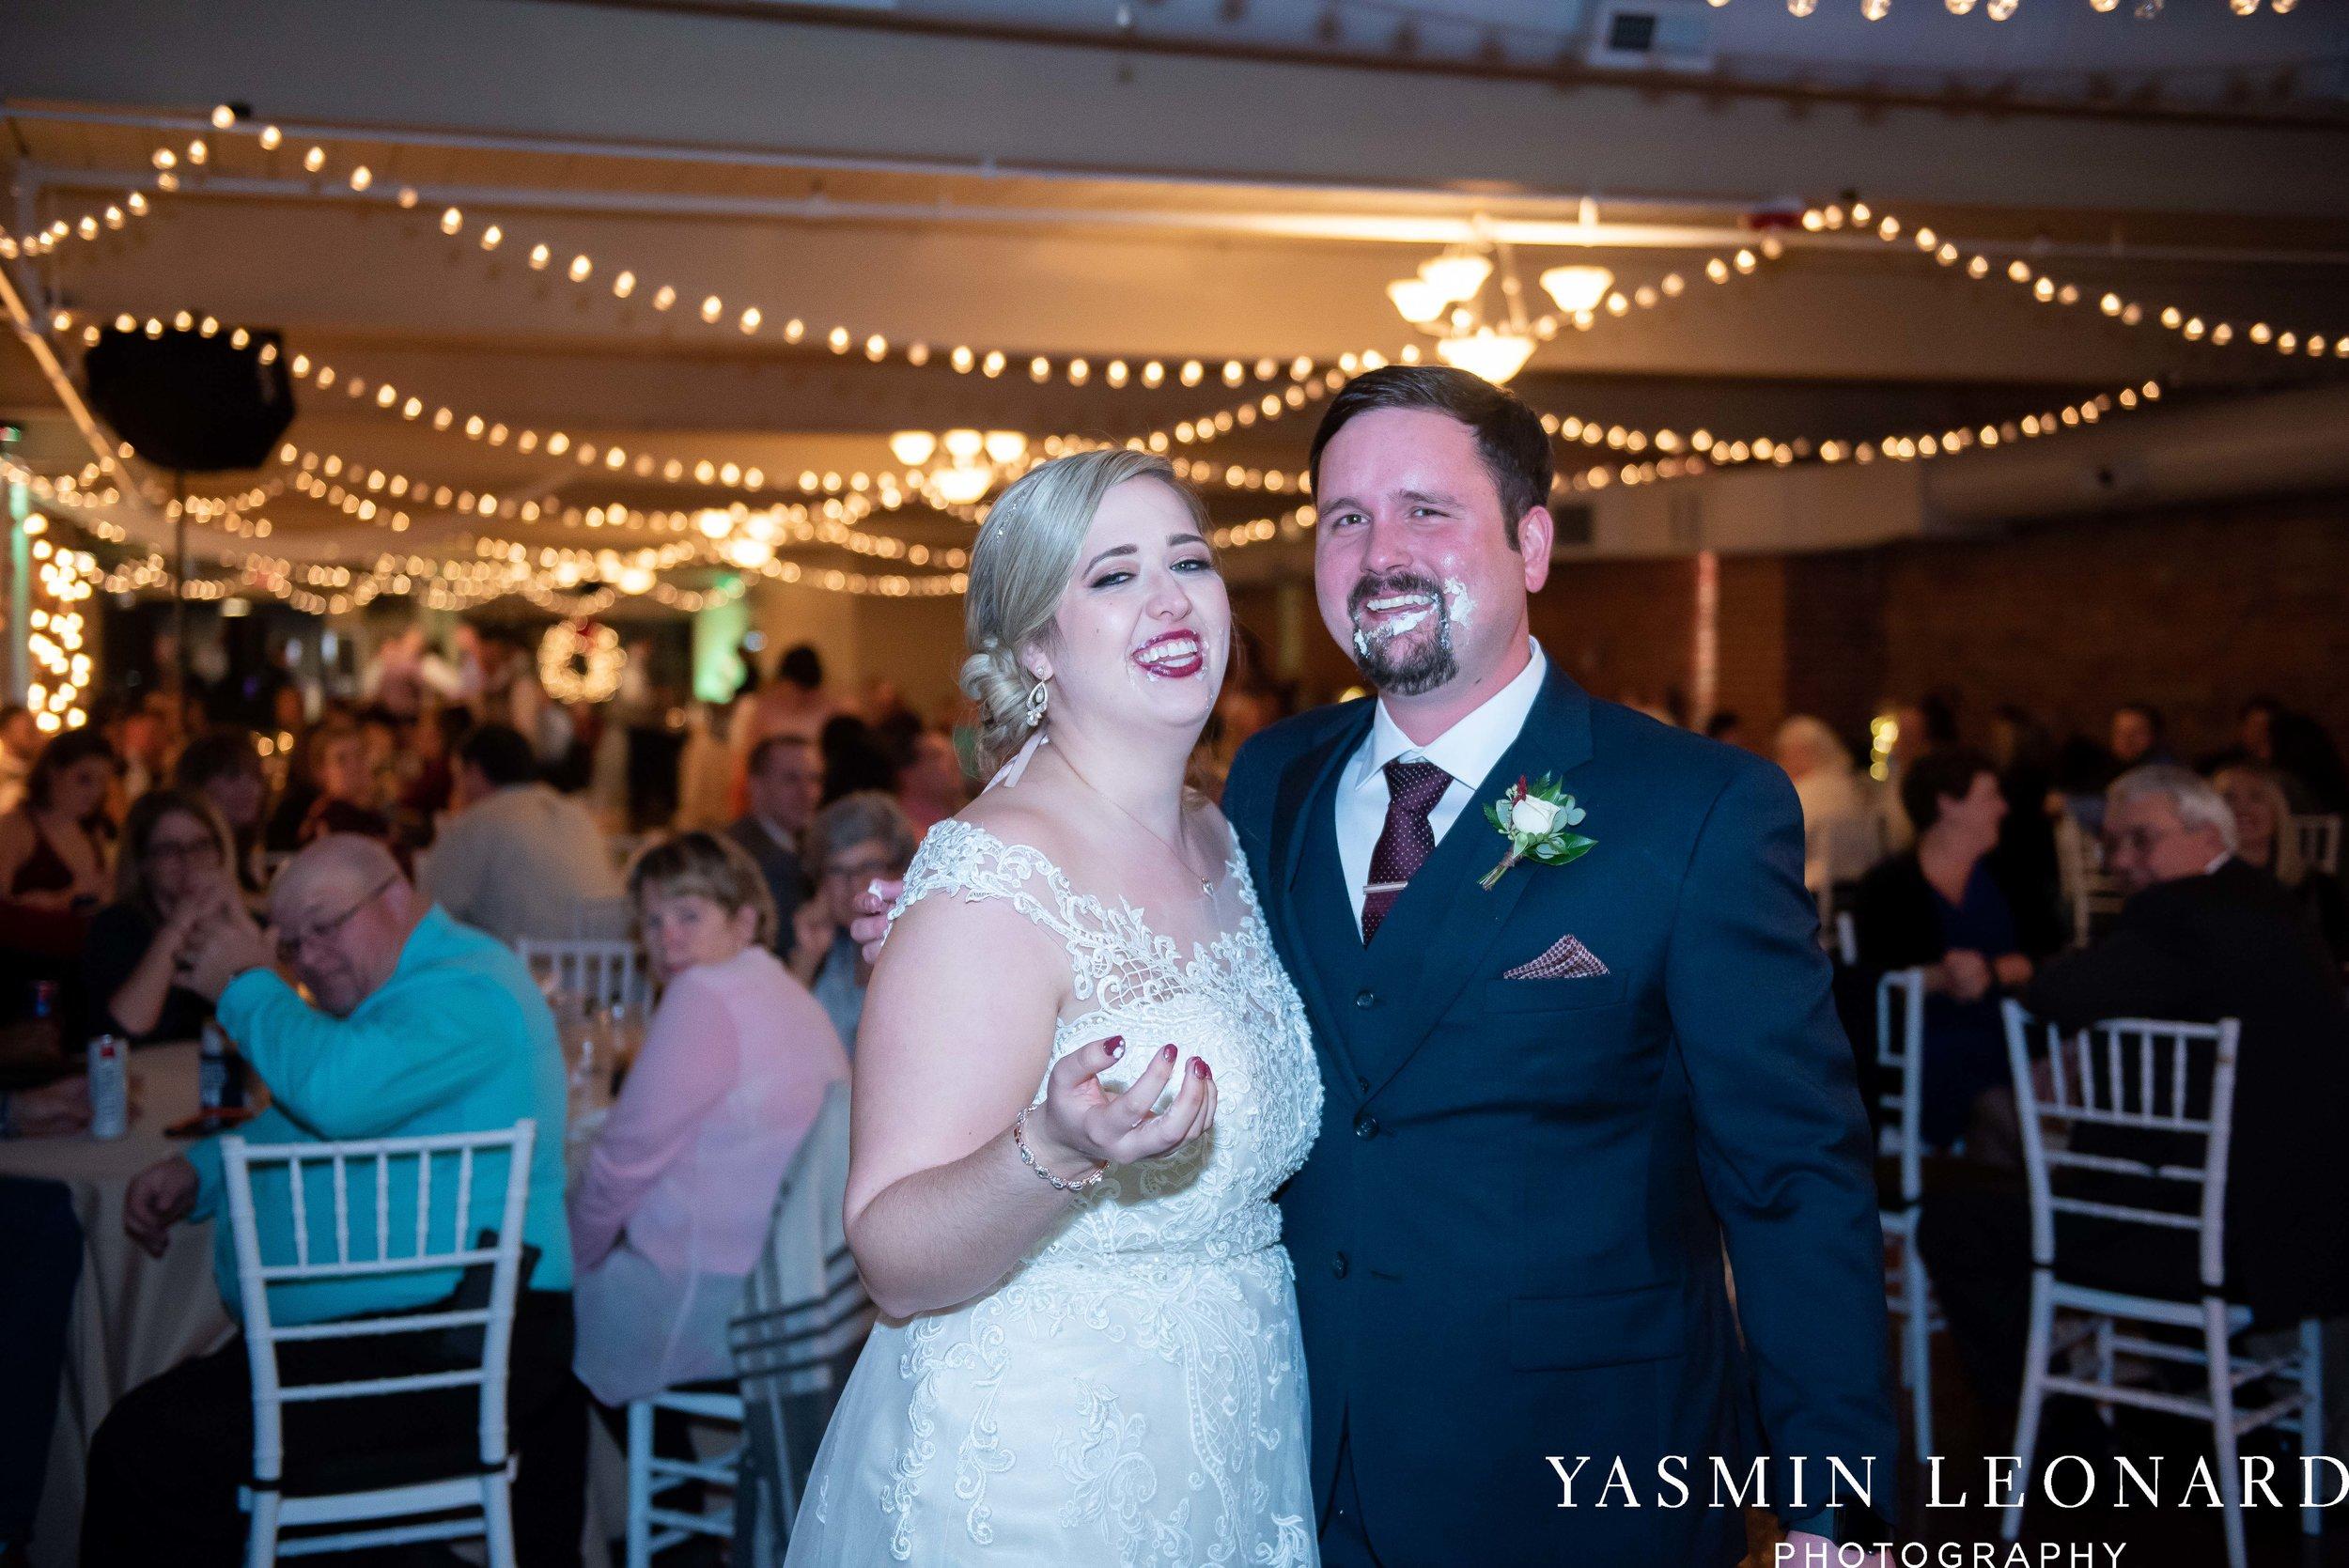 Rebekah and Matt - 105 Worth Event Centre - Yasmin Leonard Photography - Asheboro Wedding - NC Wedding - High Point Weddings - Triad Weddings - Winter Wedding-60.jpg